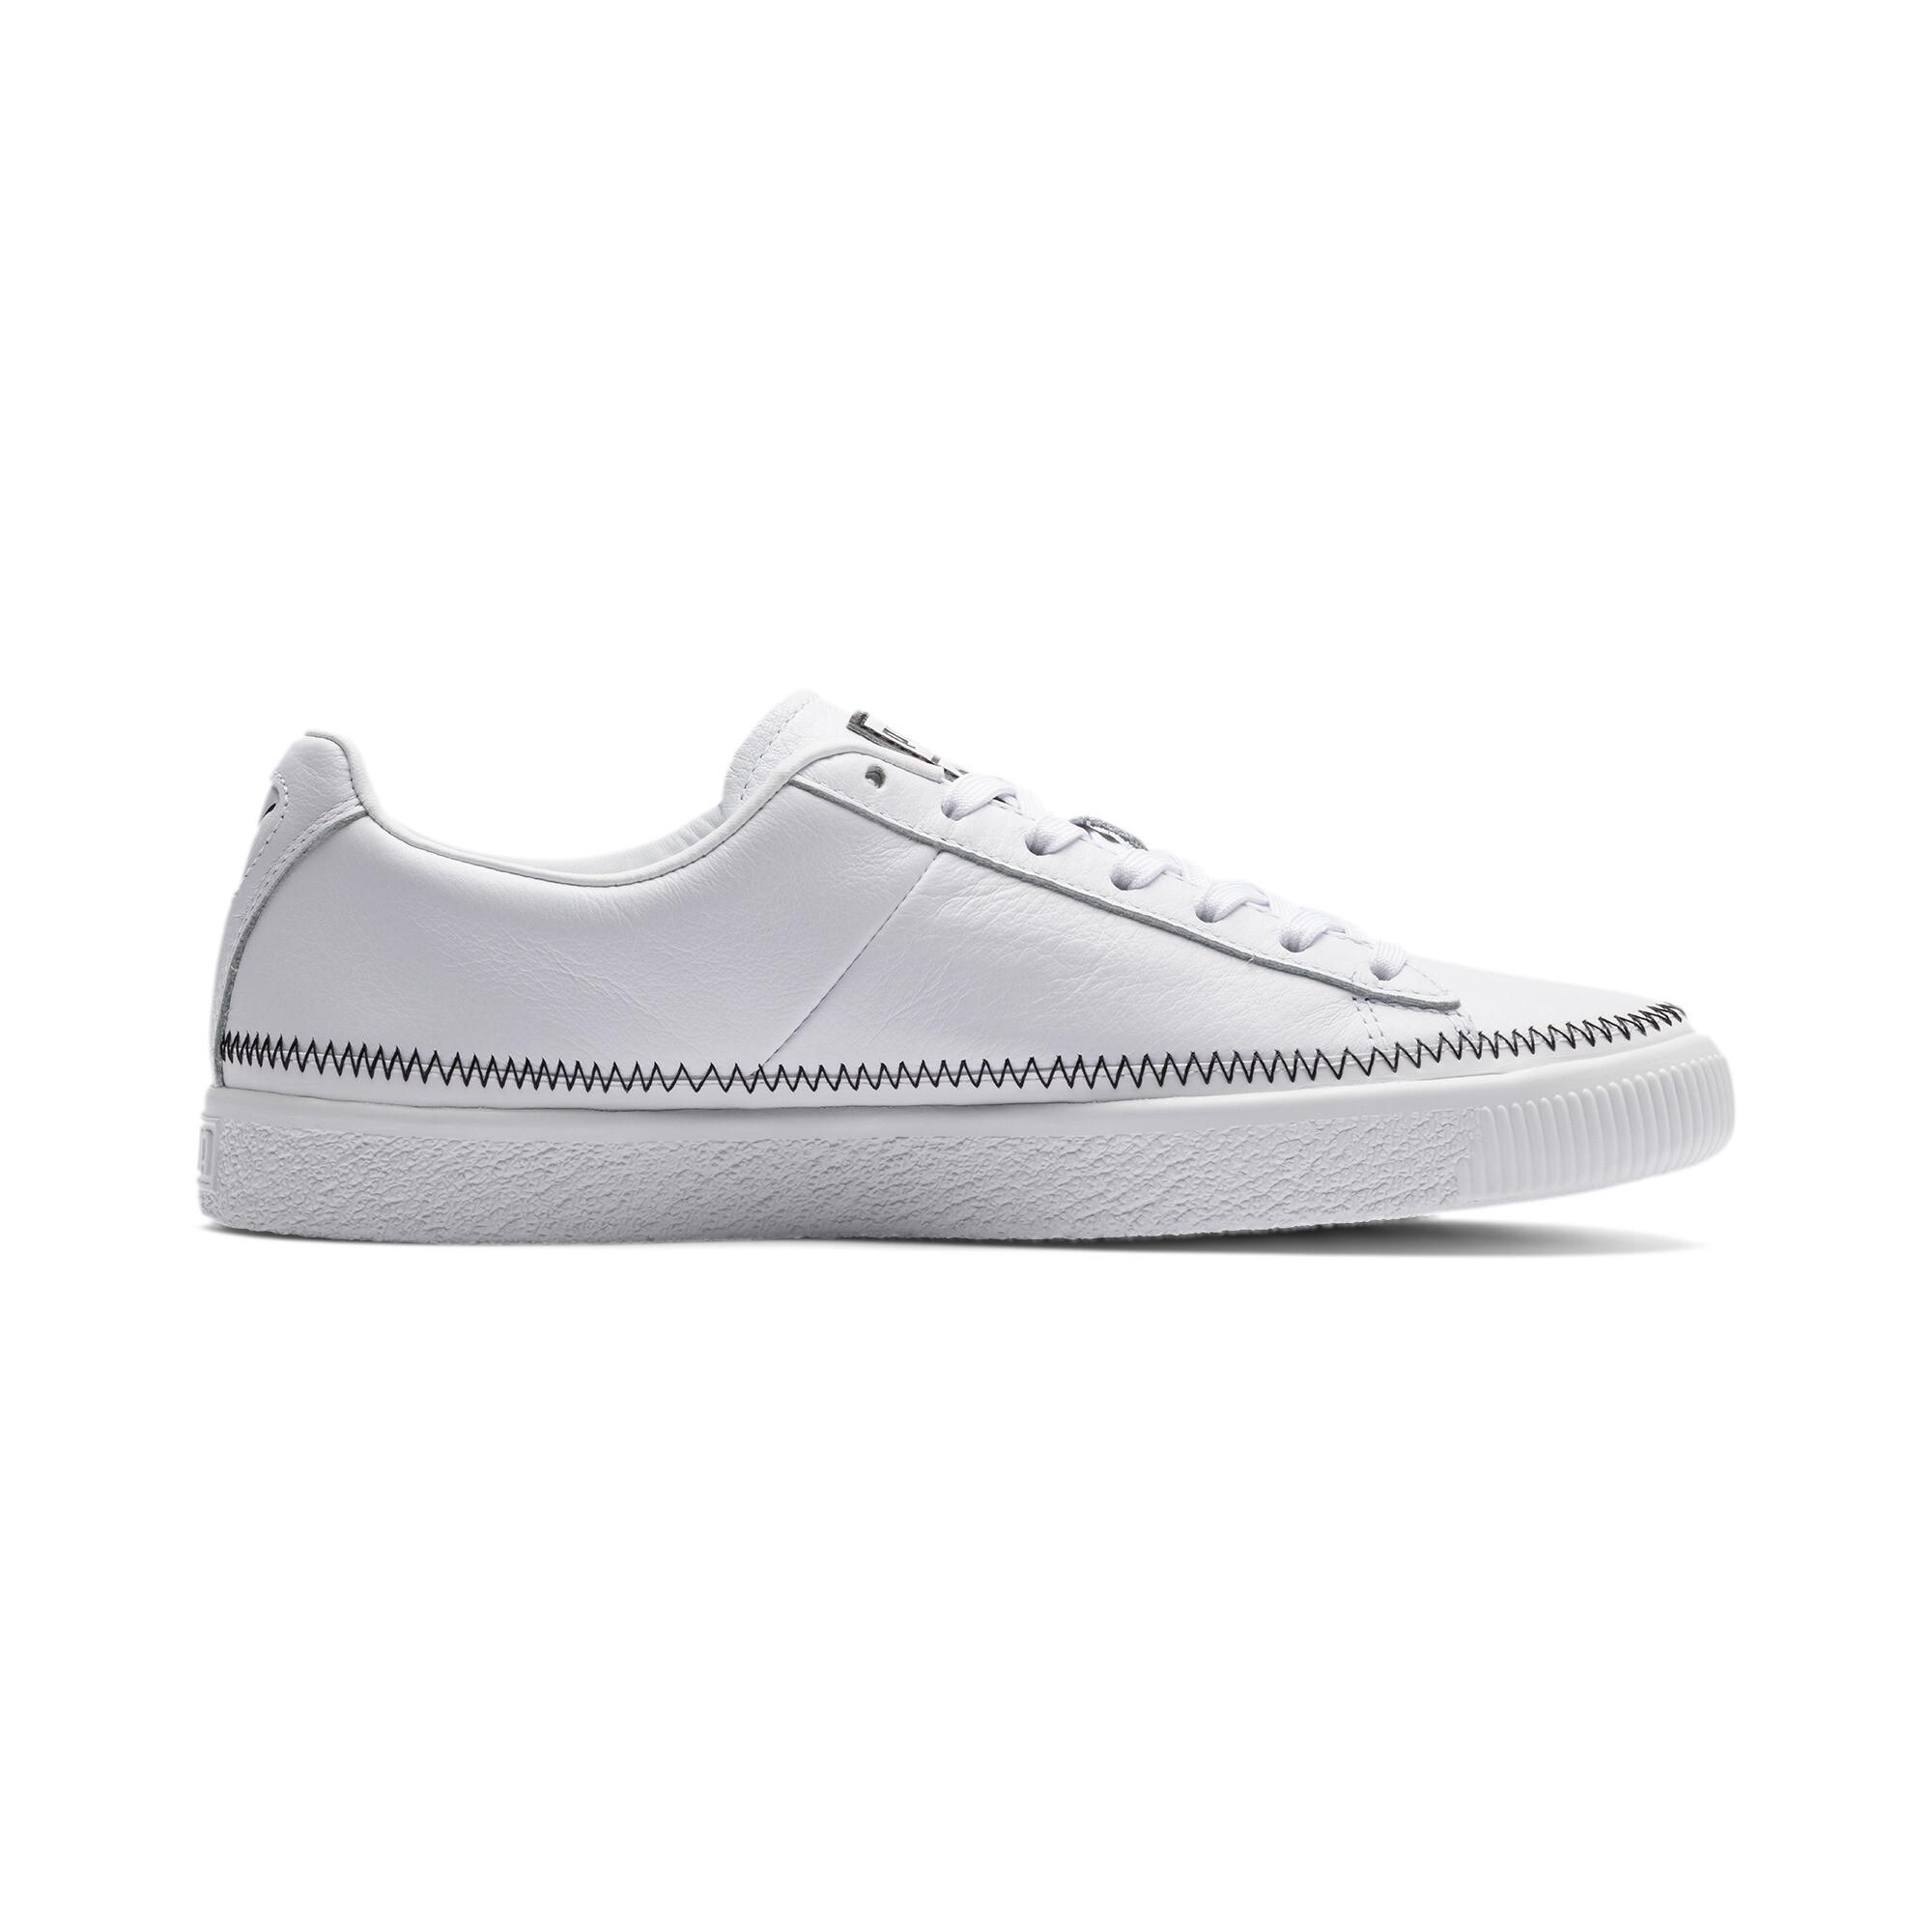 PUMA-Basket-Stitch-Sneaker-Unisex-Schuhe-Neu Indexbild 18